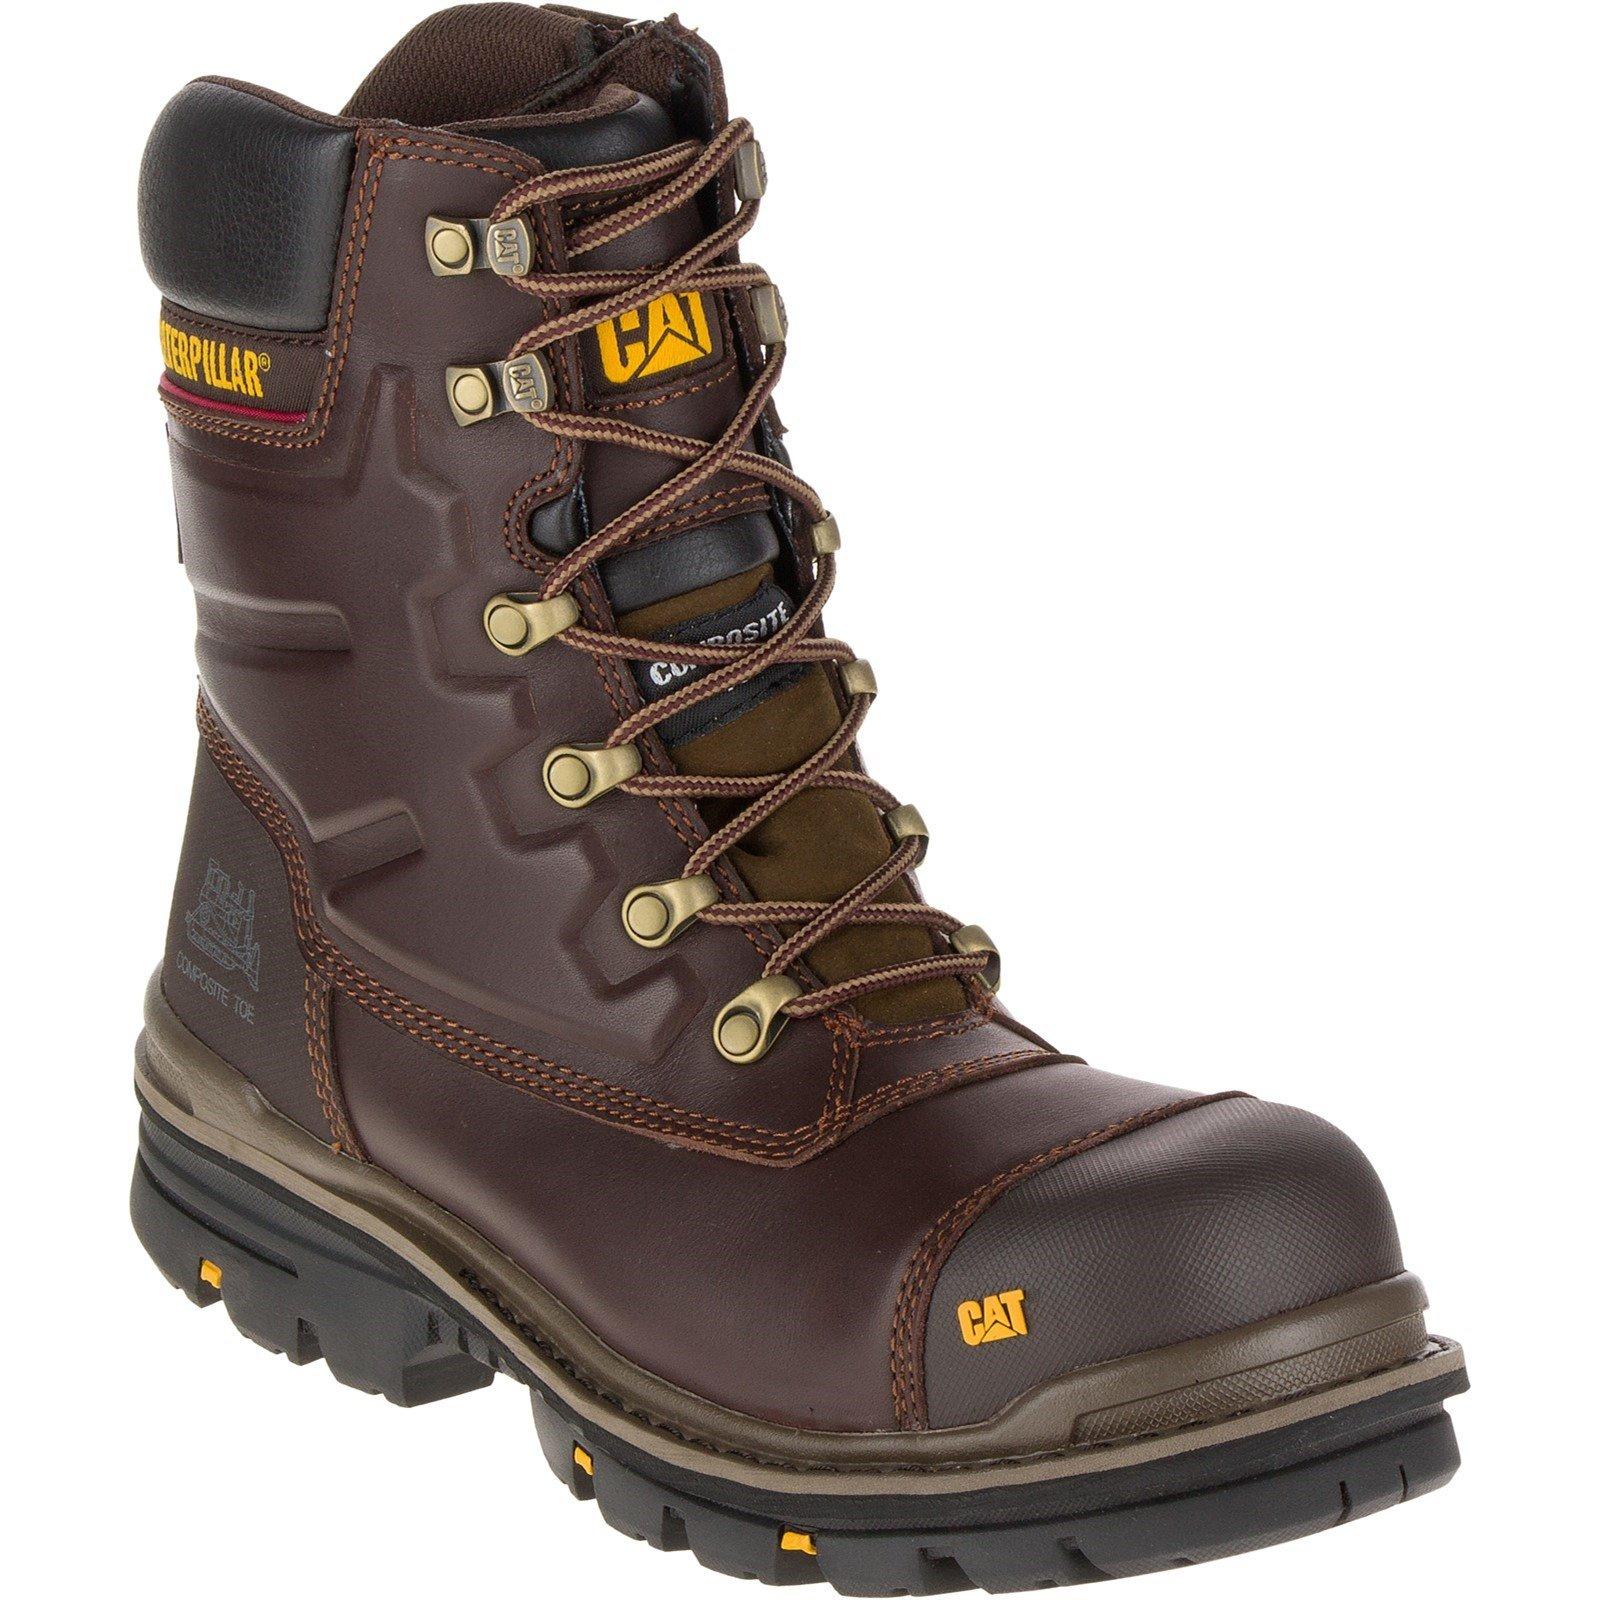 Caterpillar Unisex Premier Boot Brown 32959 - Brown 6